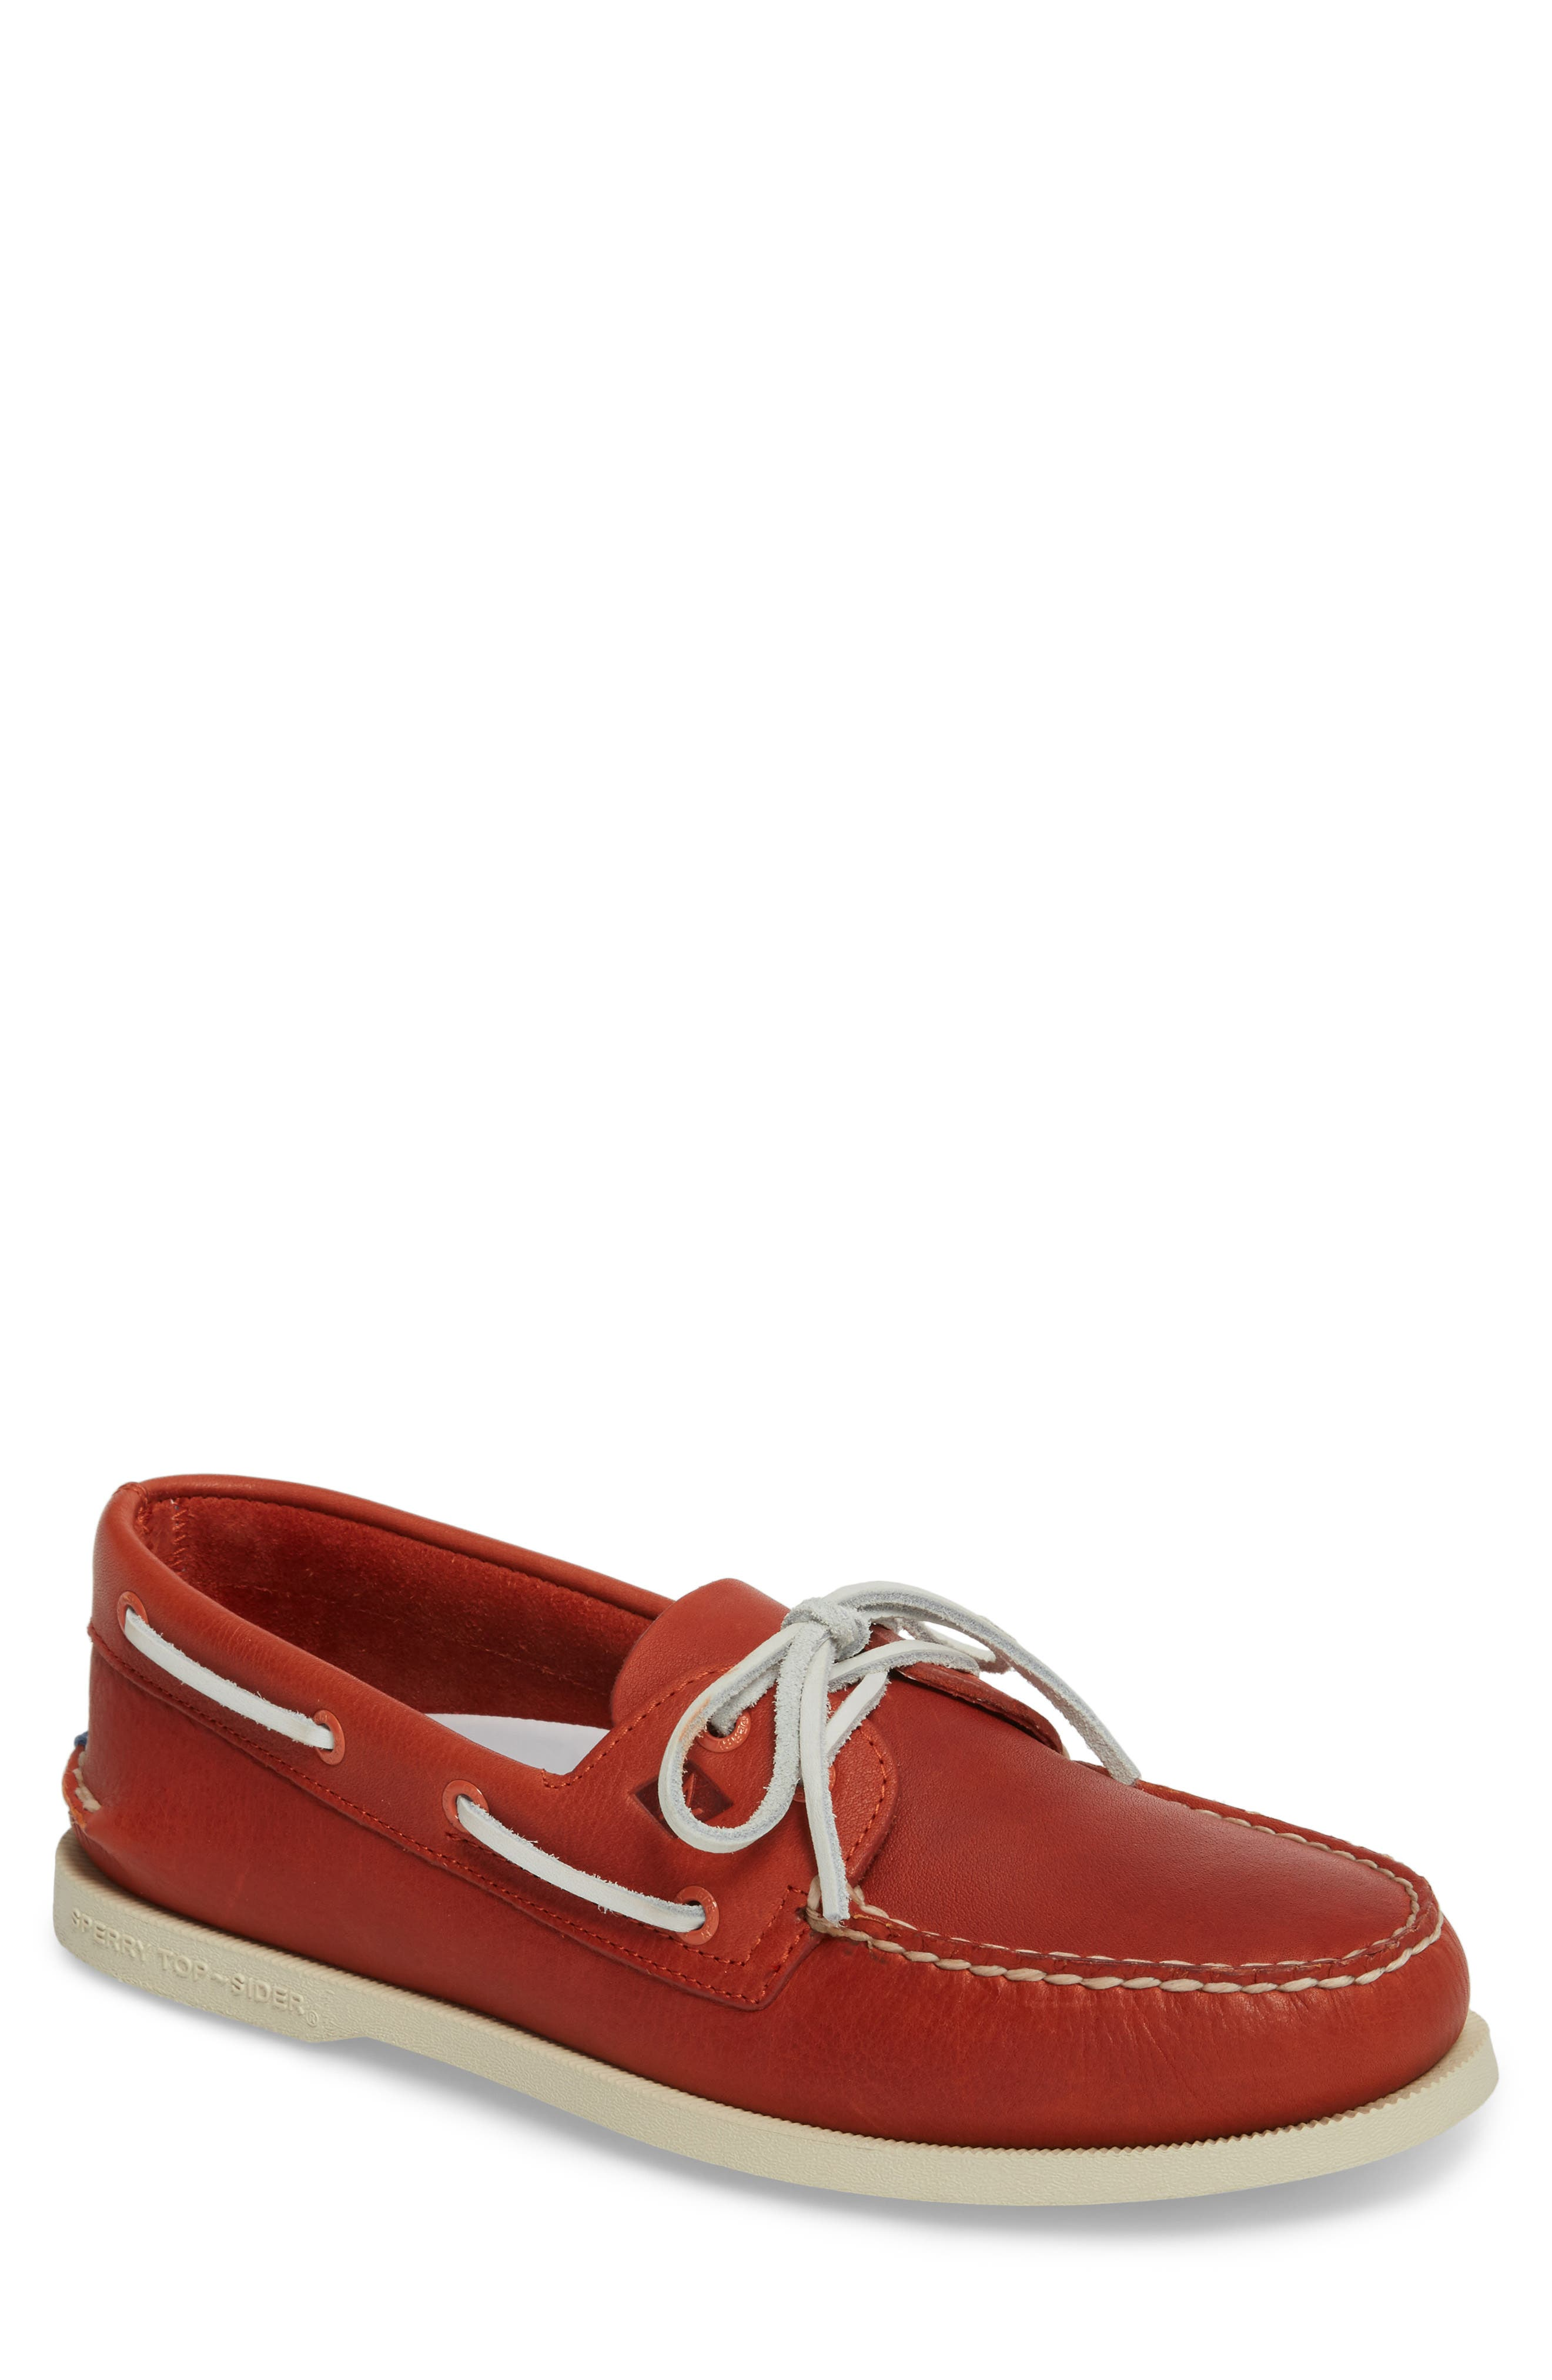 Main Image - Sperry AO 2 Eye Daytona Boat Shoe (Men)